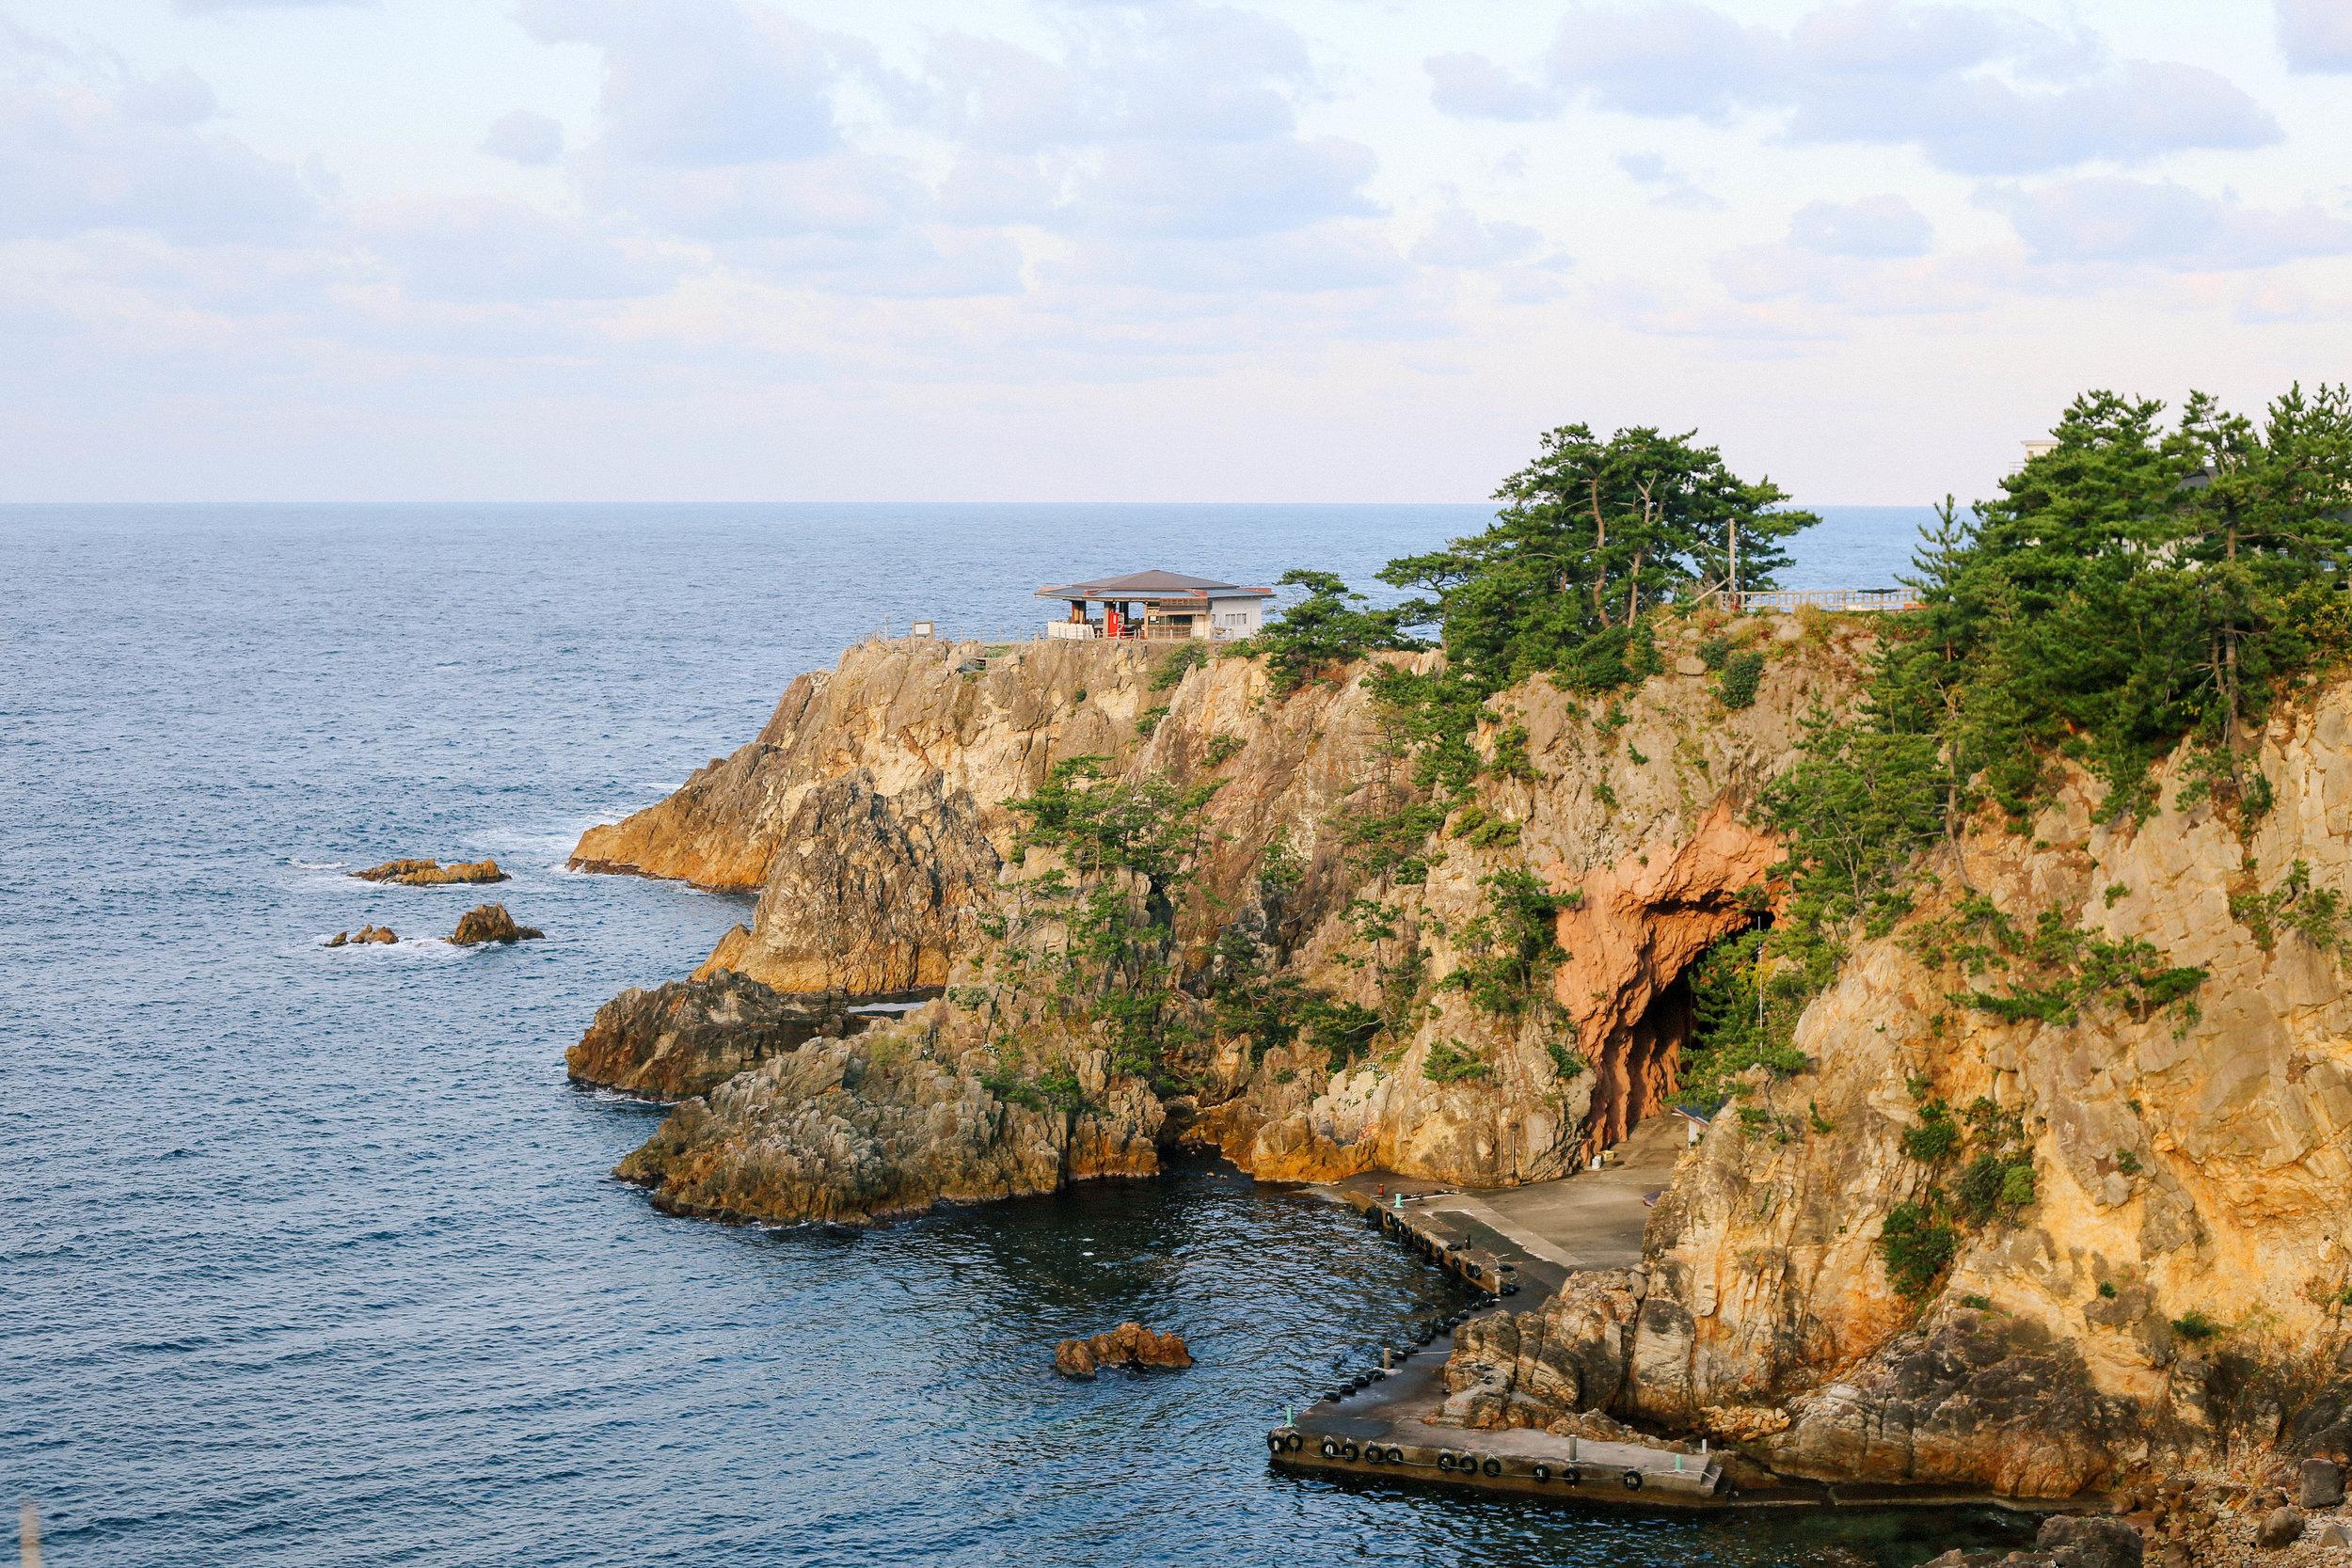 ashleigh-leech-someform-sado-island-niigata-japan-20.jpg